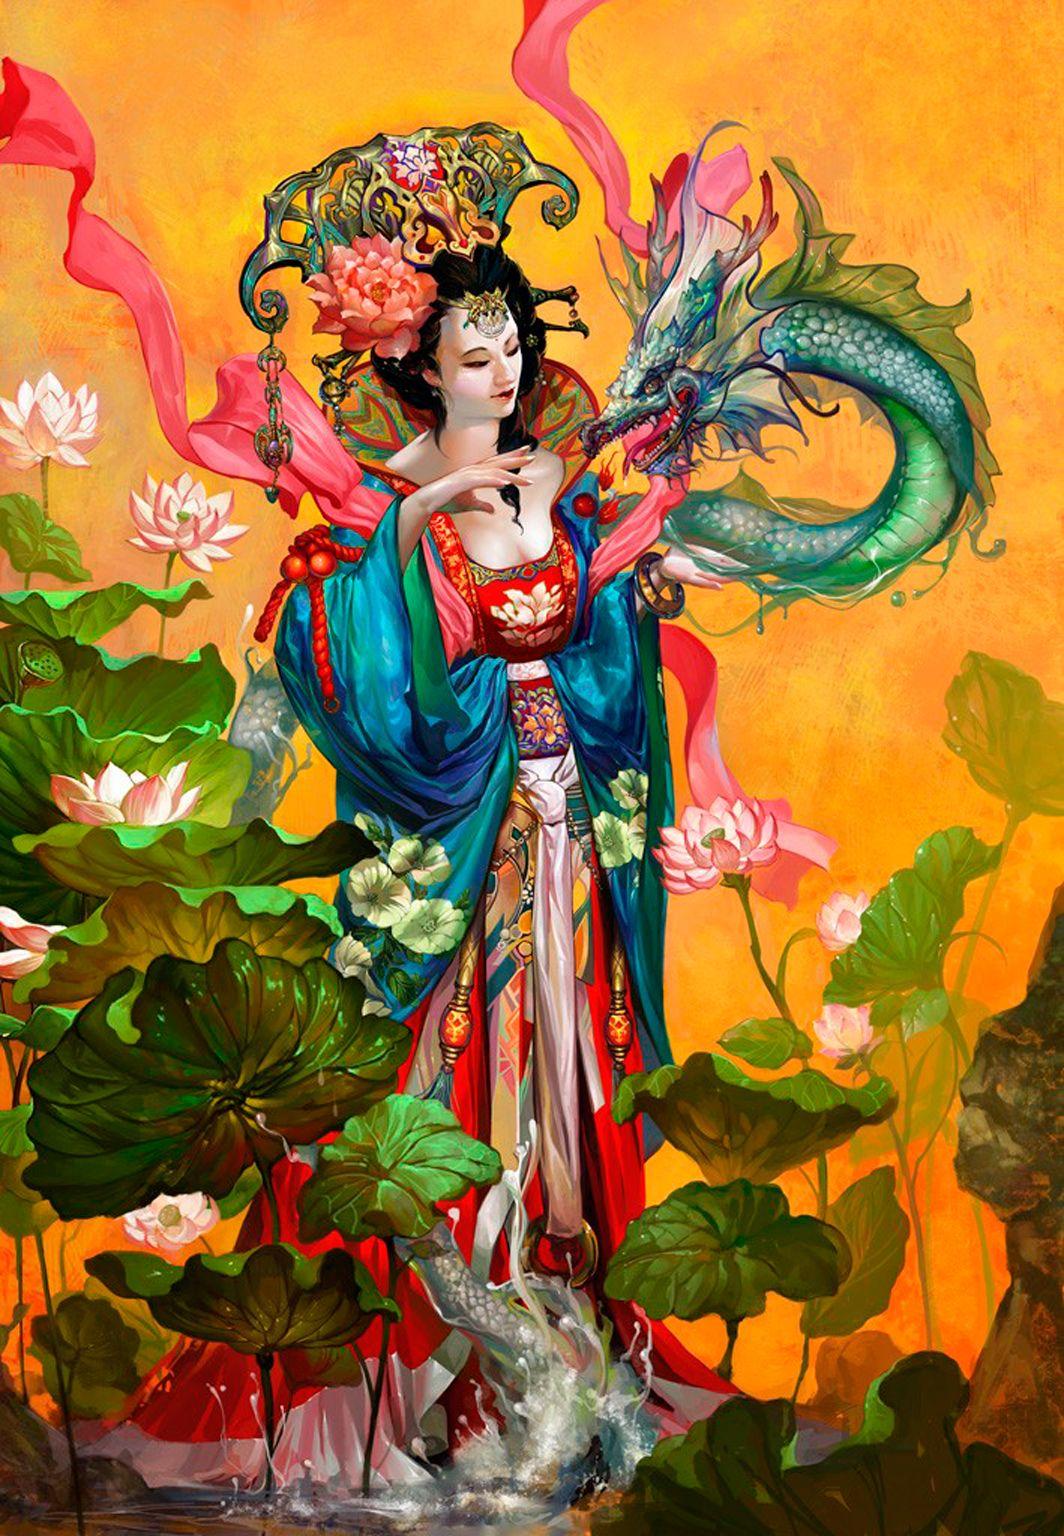 Asian mythology drawingstures, girdle photos mature xxx